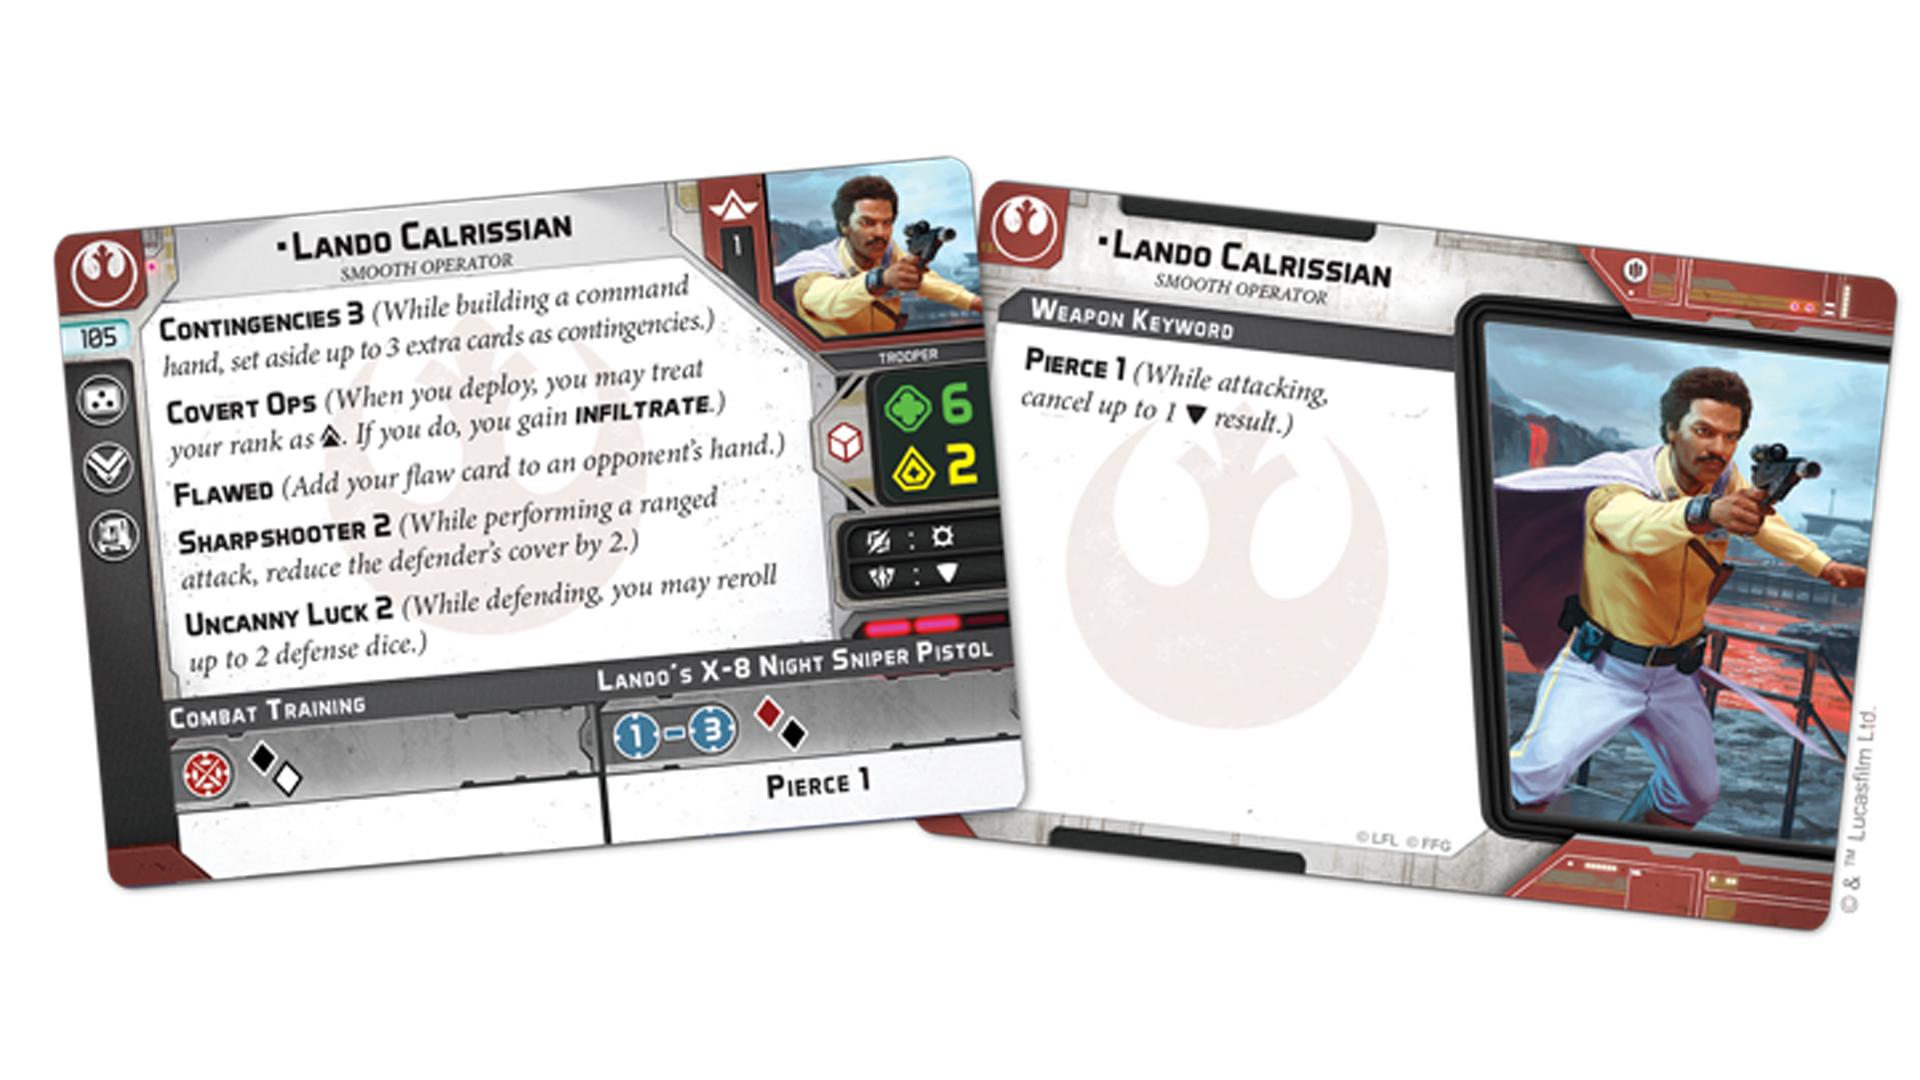 Lando Calrissian Star Wars: Legion cards